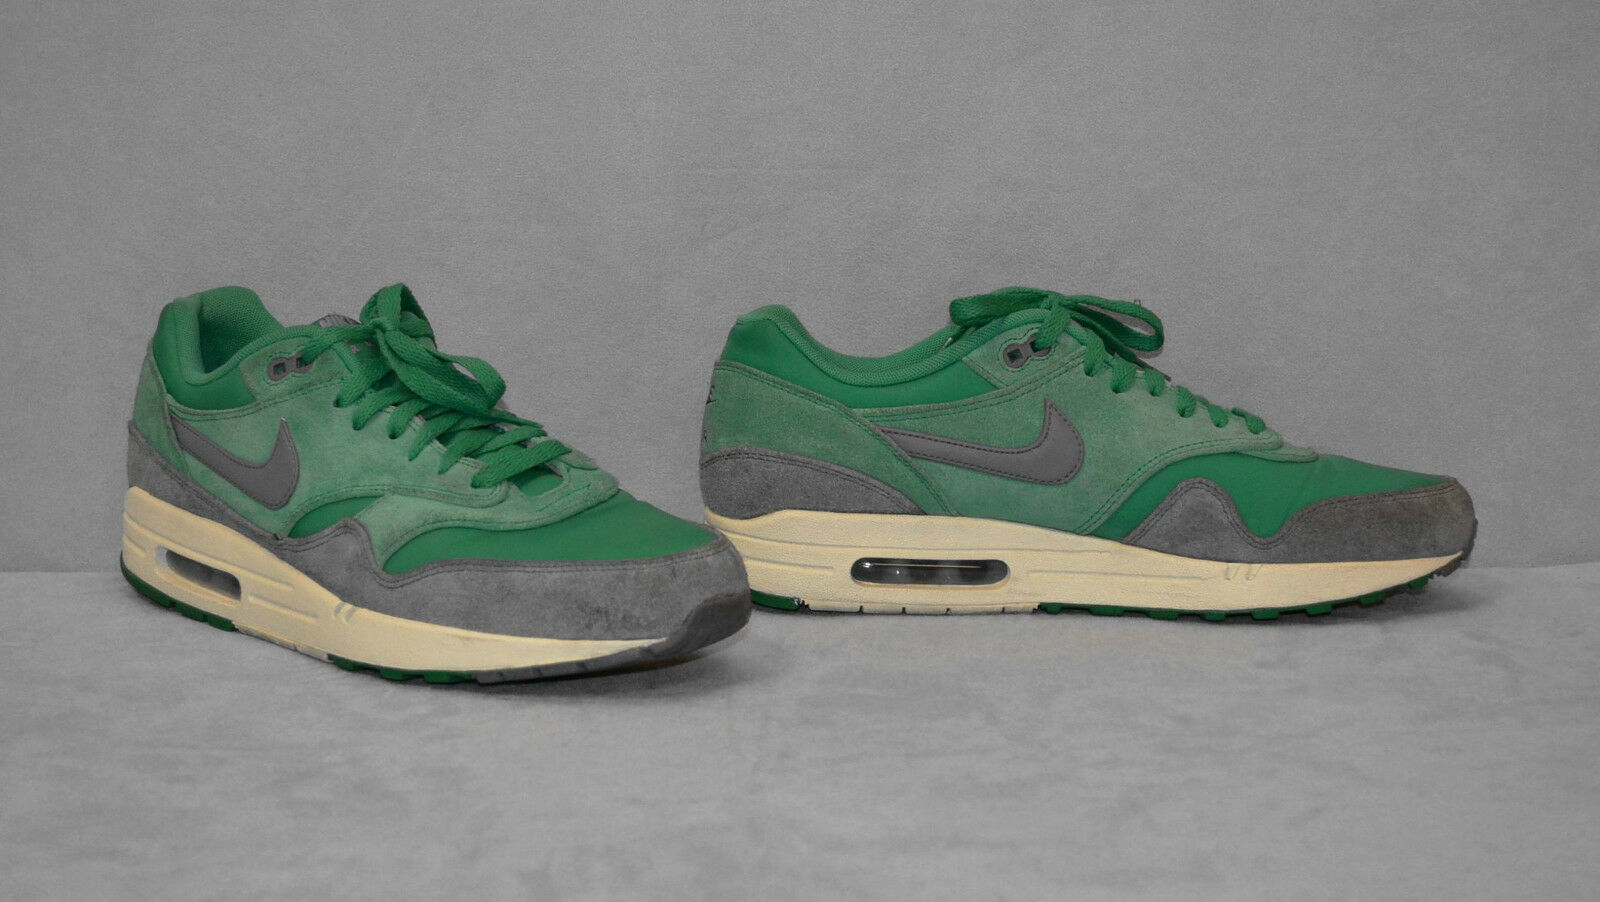 Premio nike air max a8 auth verde / grey cosa / cosa grey 512033-306 camoscio patch scarpe taglia 11 2bde2d